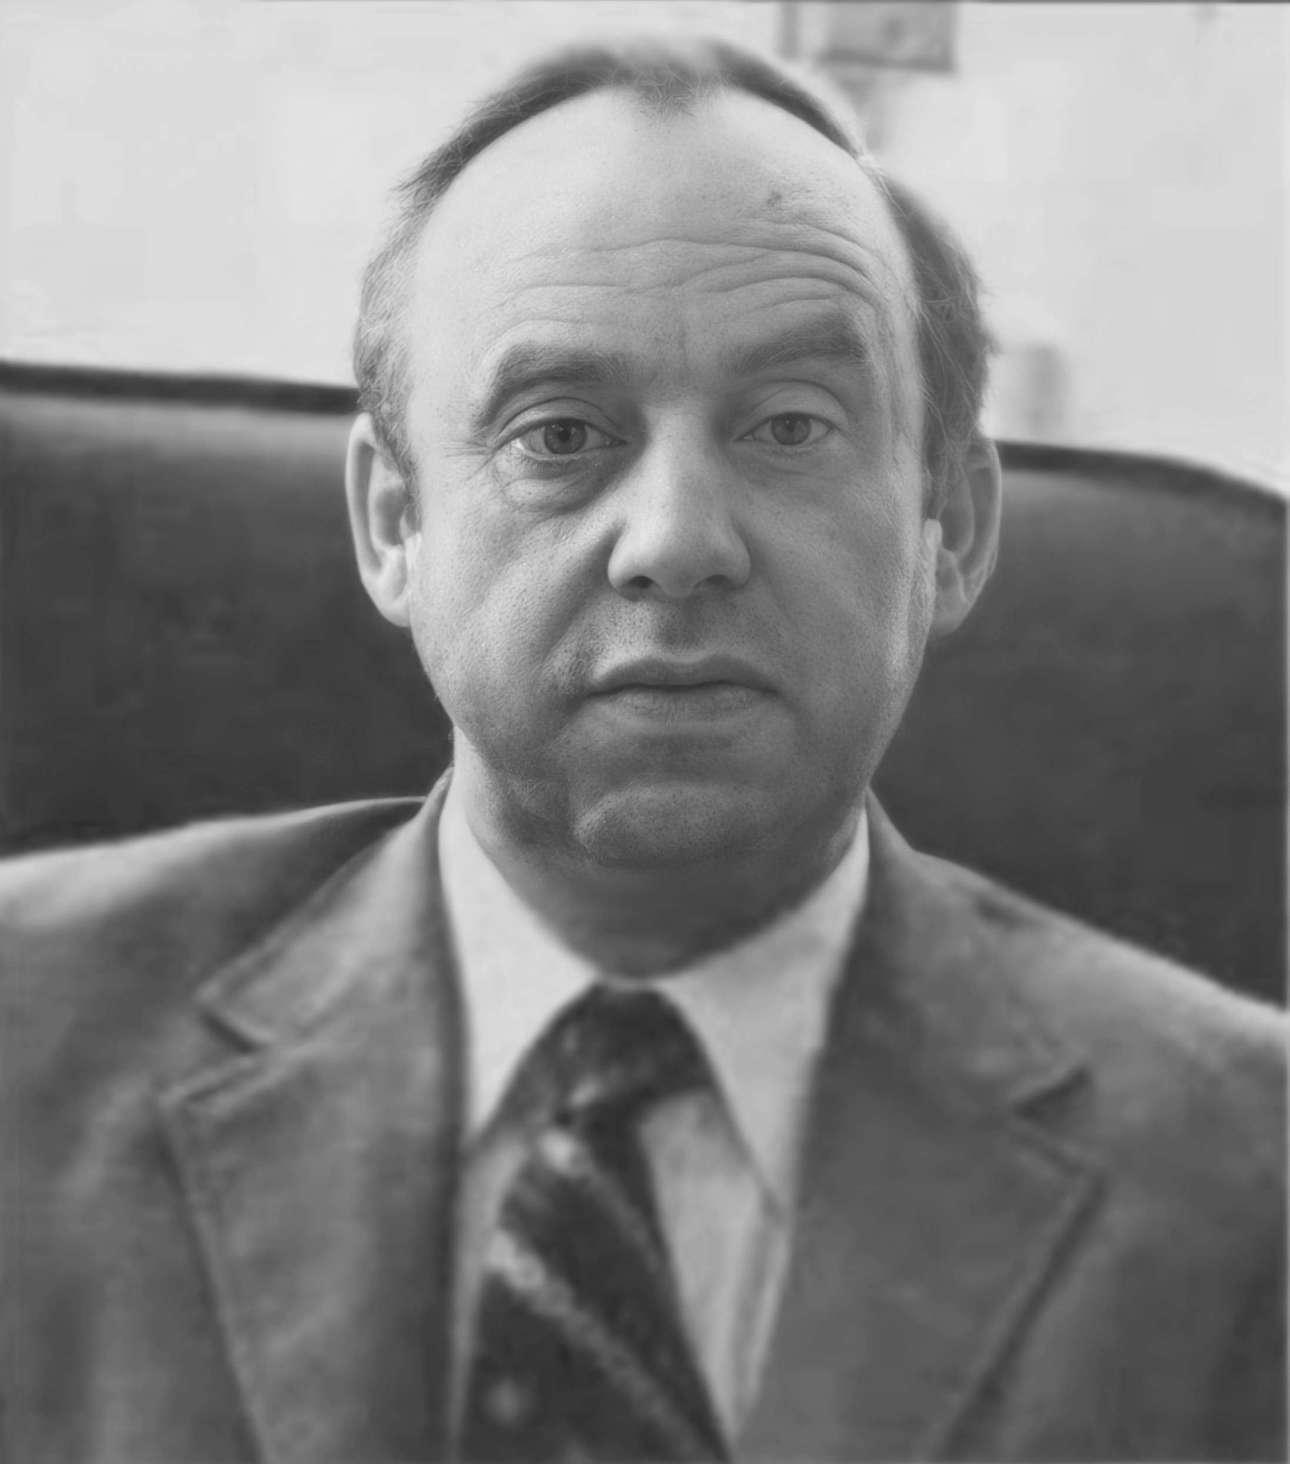 Jay C. Smith The Reinert Murders